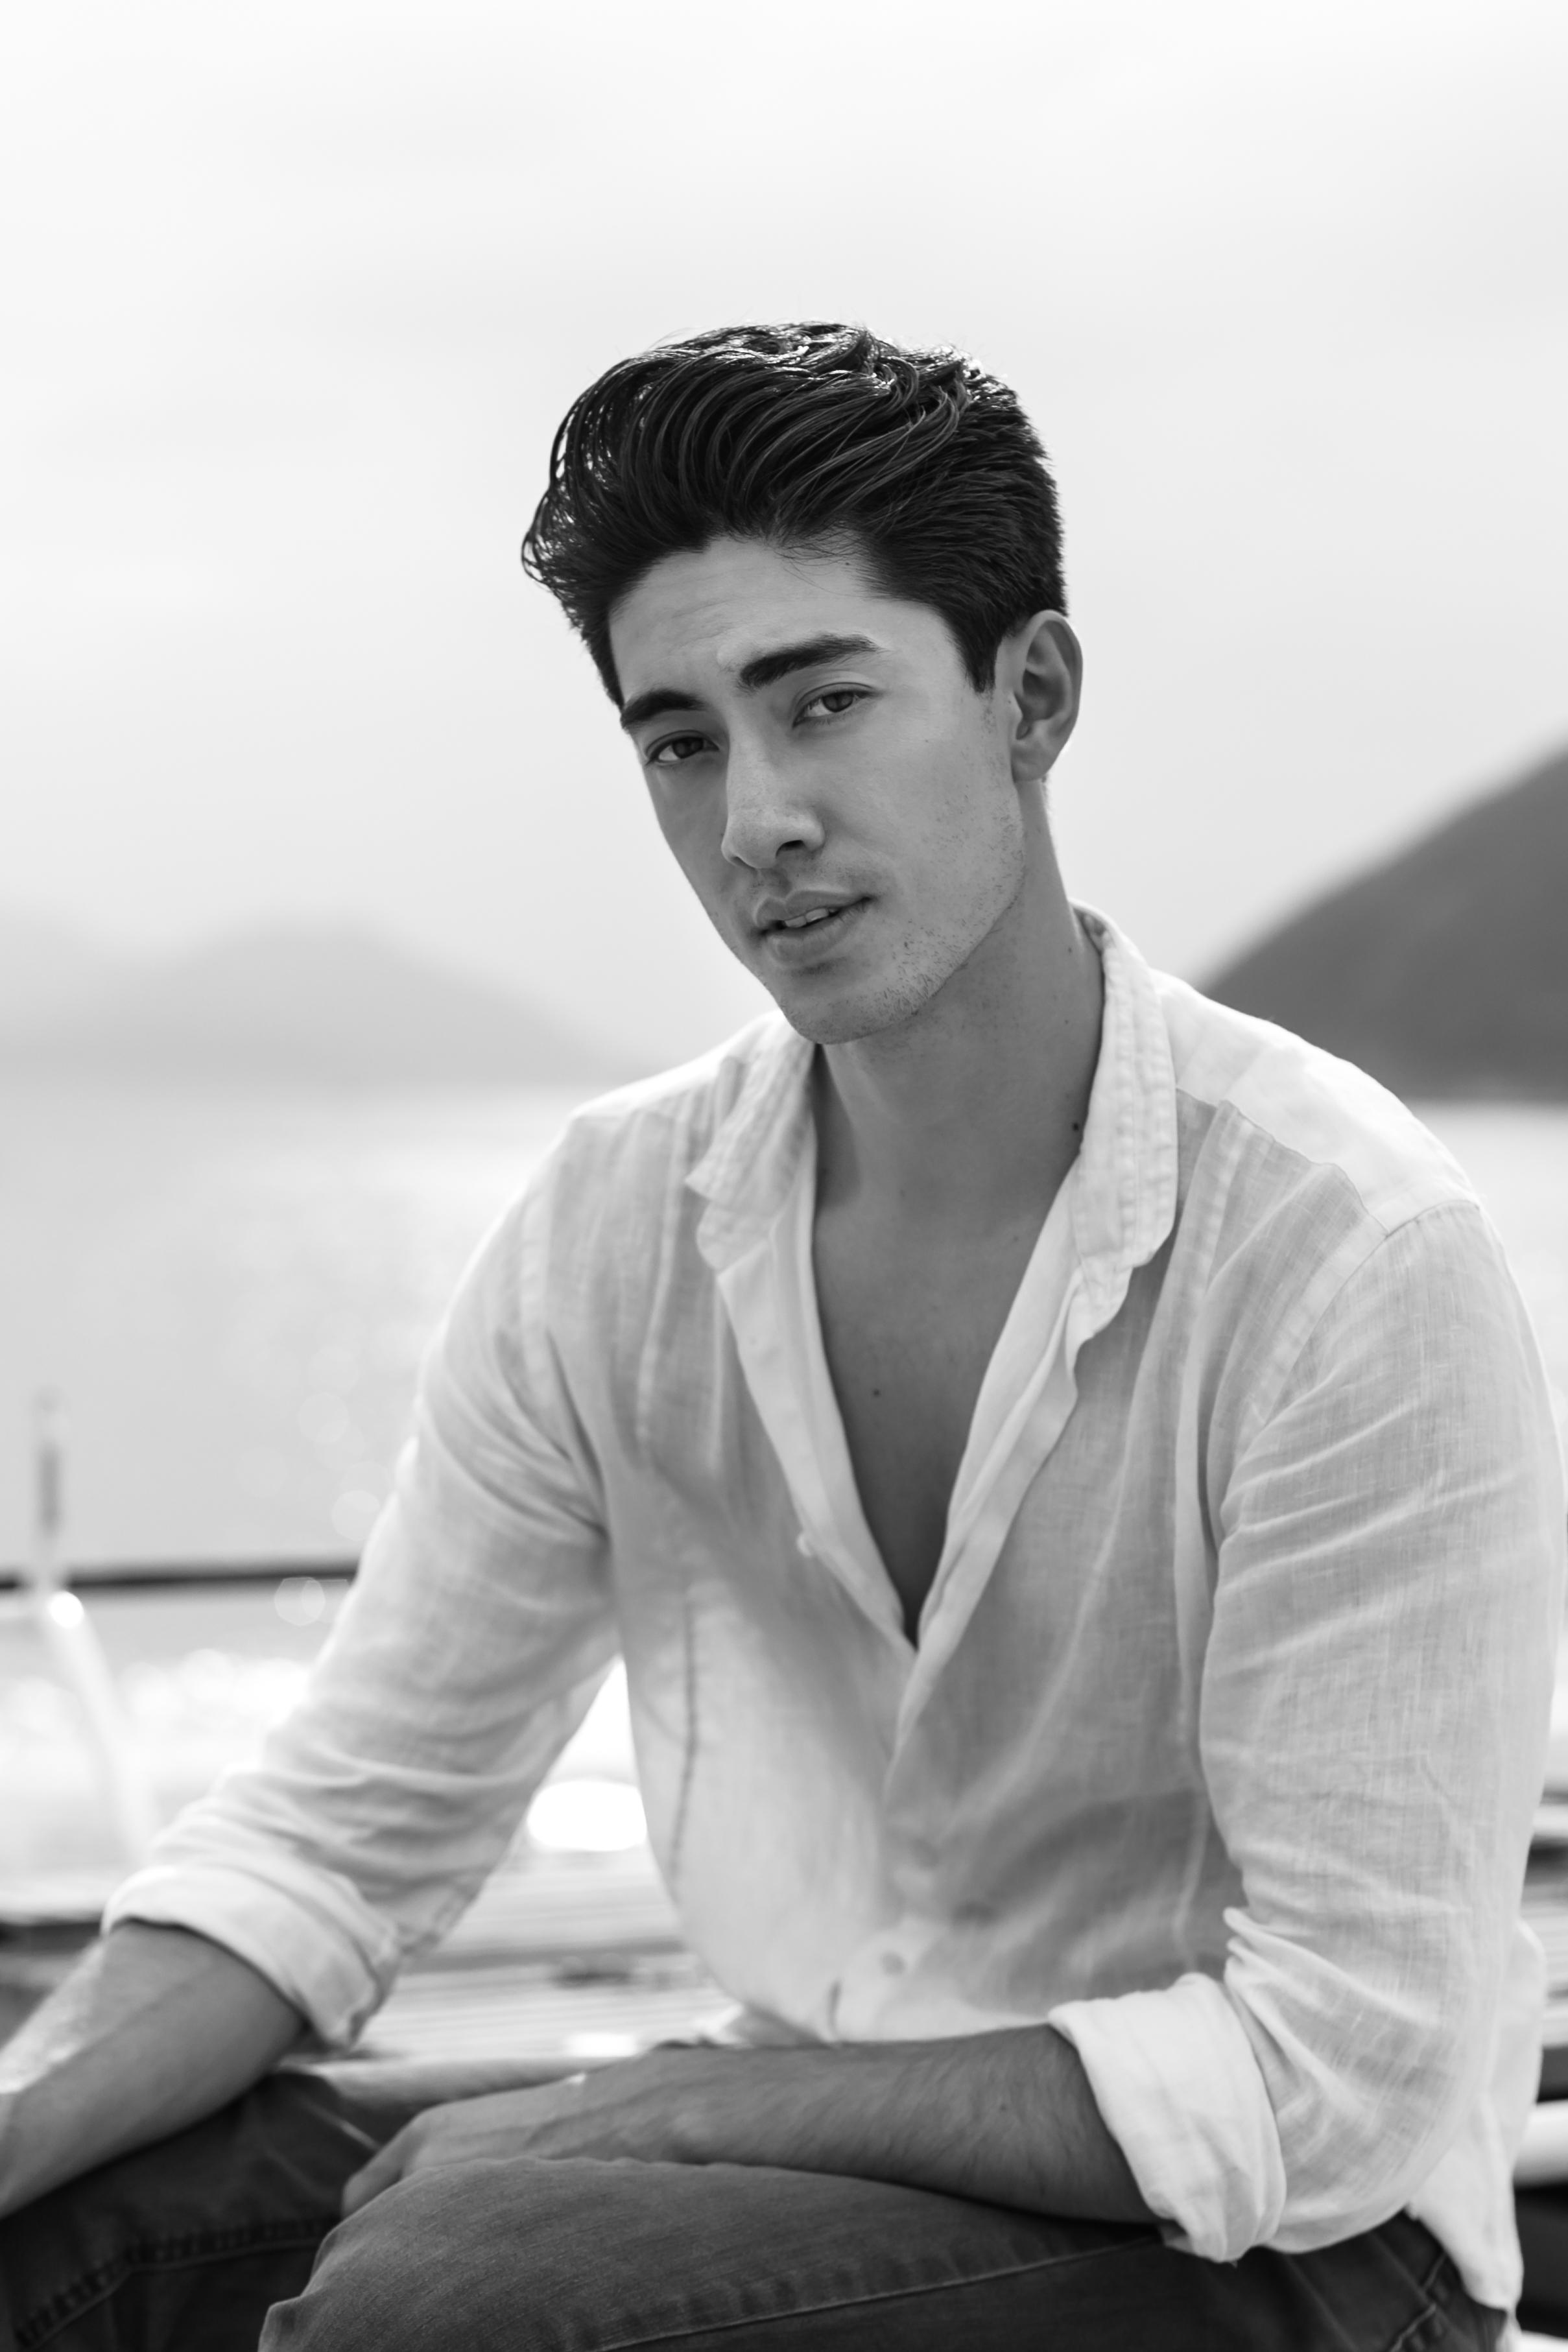 darren wong photography portrait andrea quest model hong kong